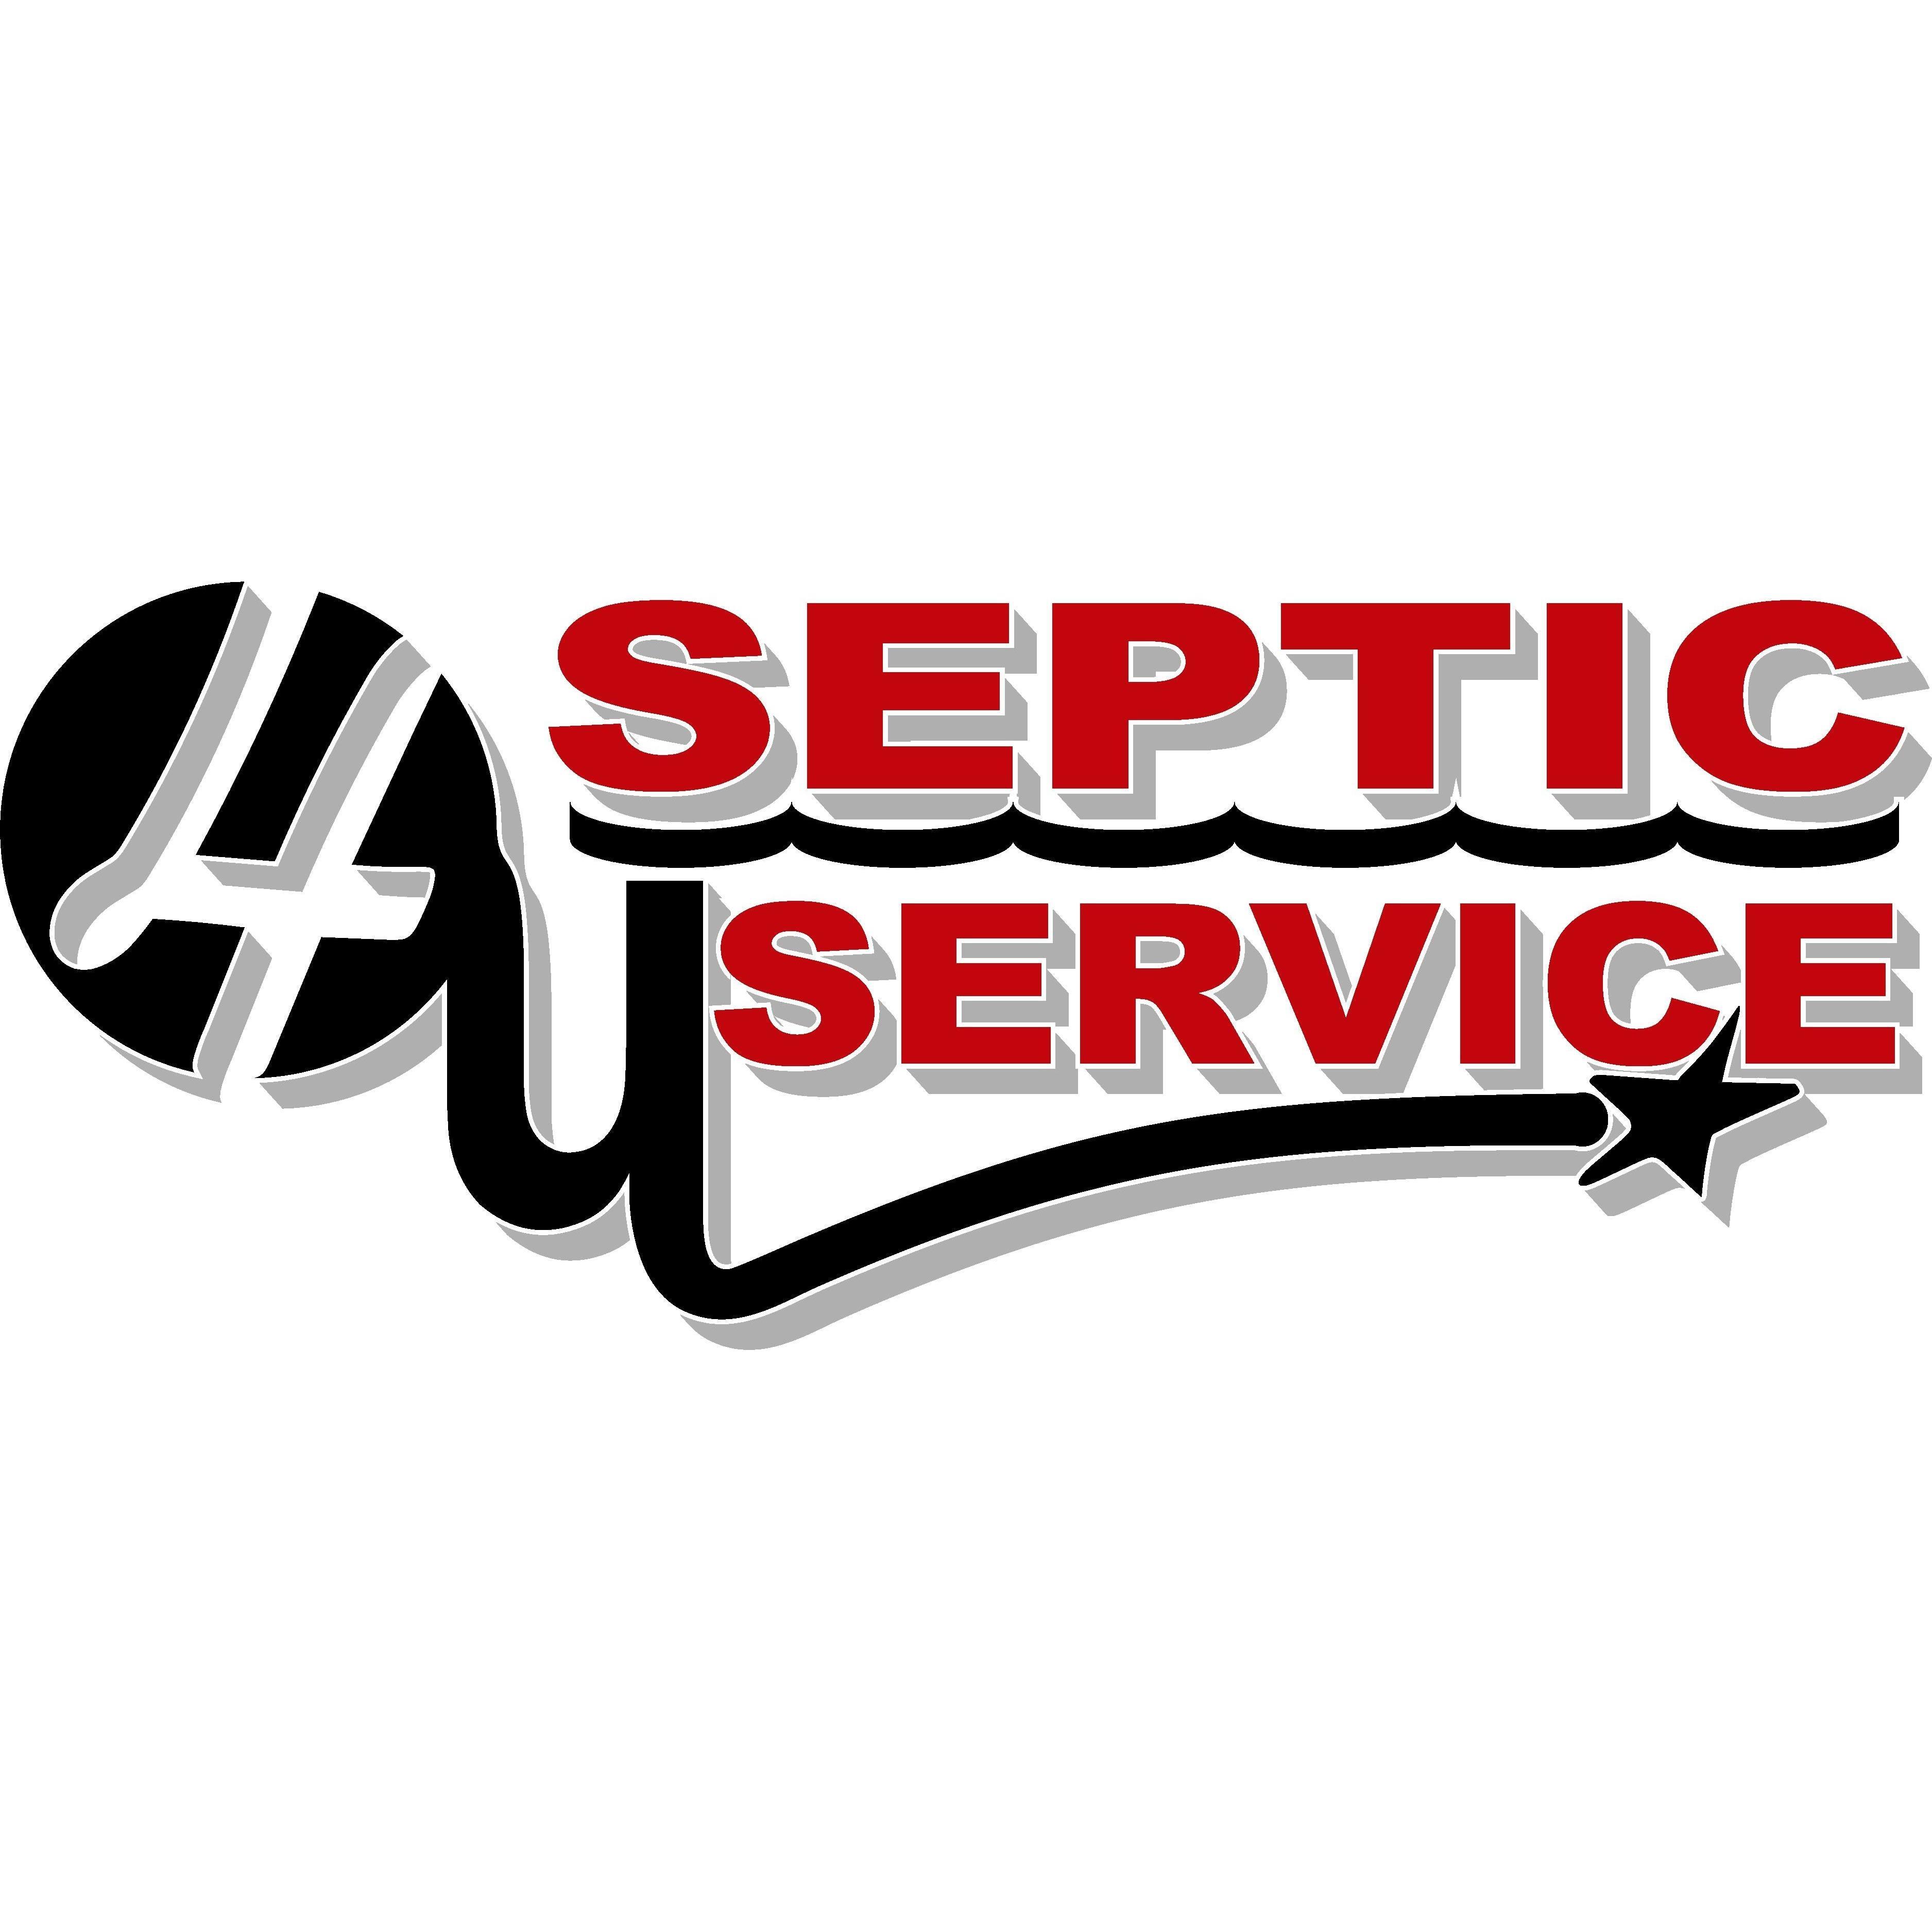 4-U Septic Service image 0